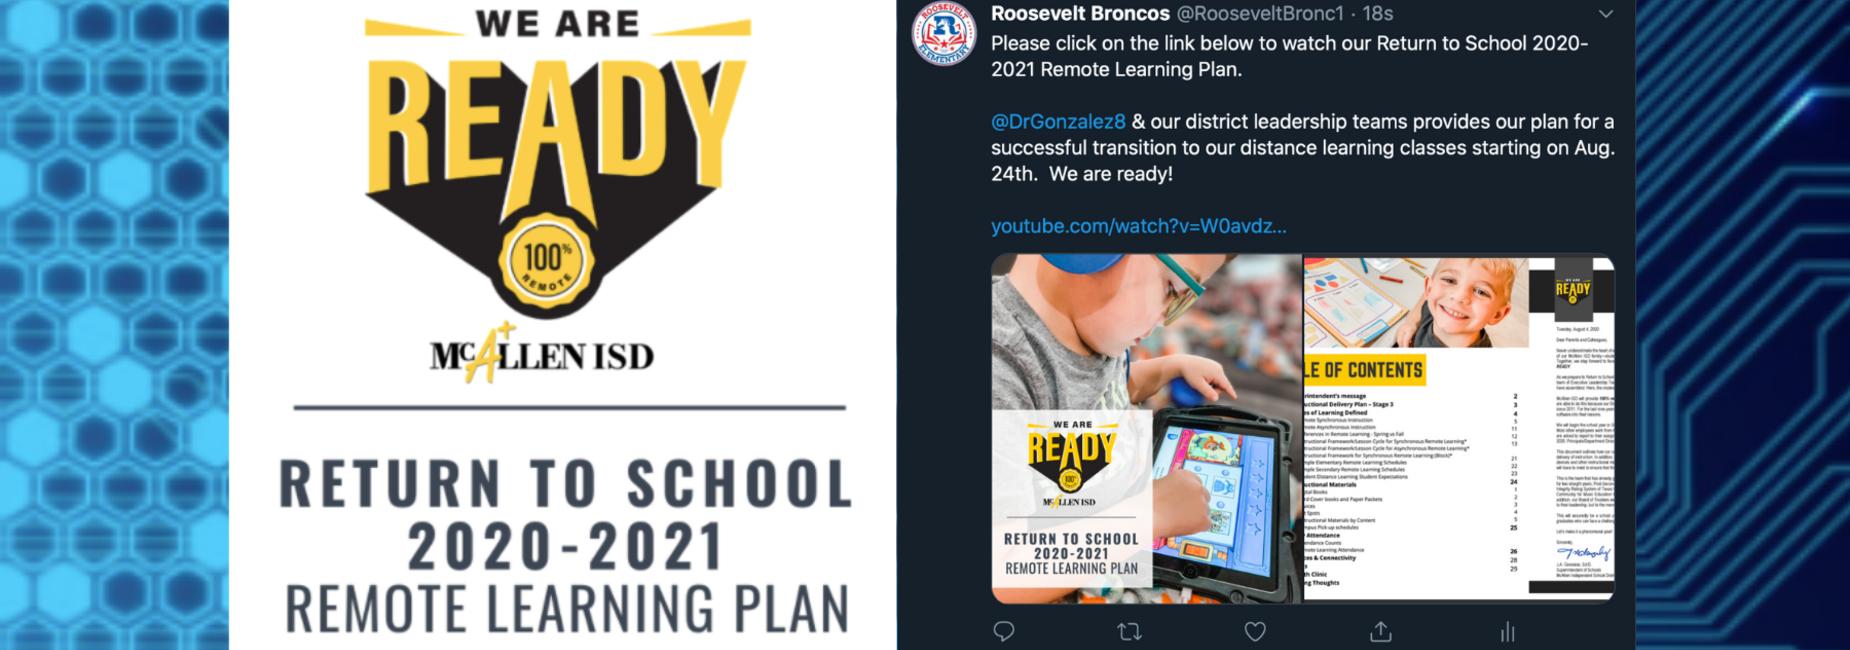 Return to School 2020-2021